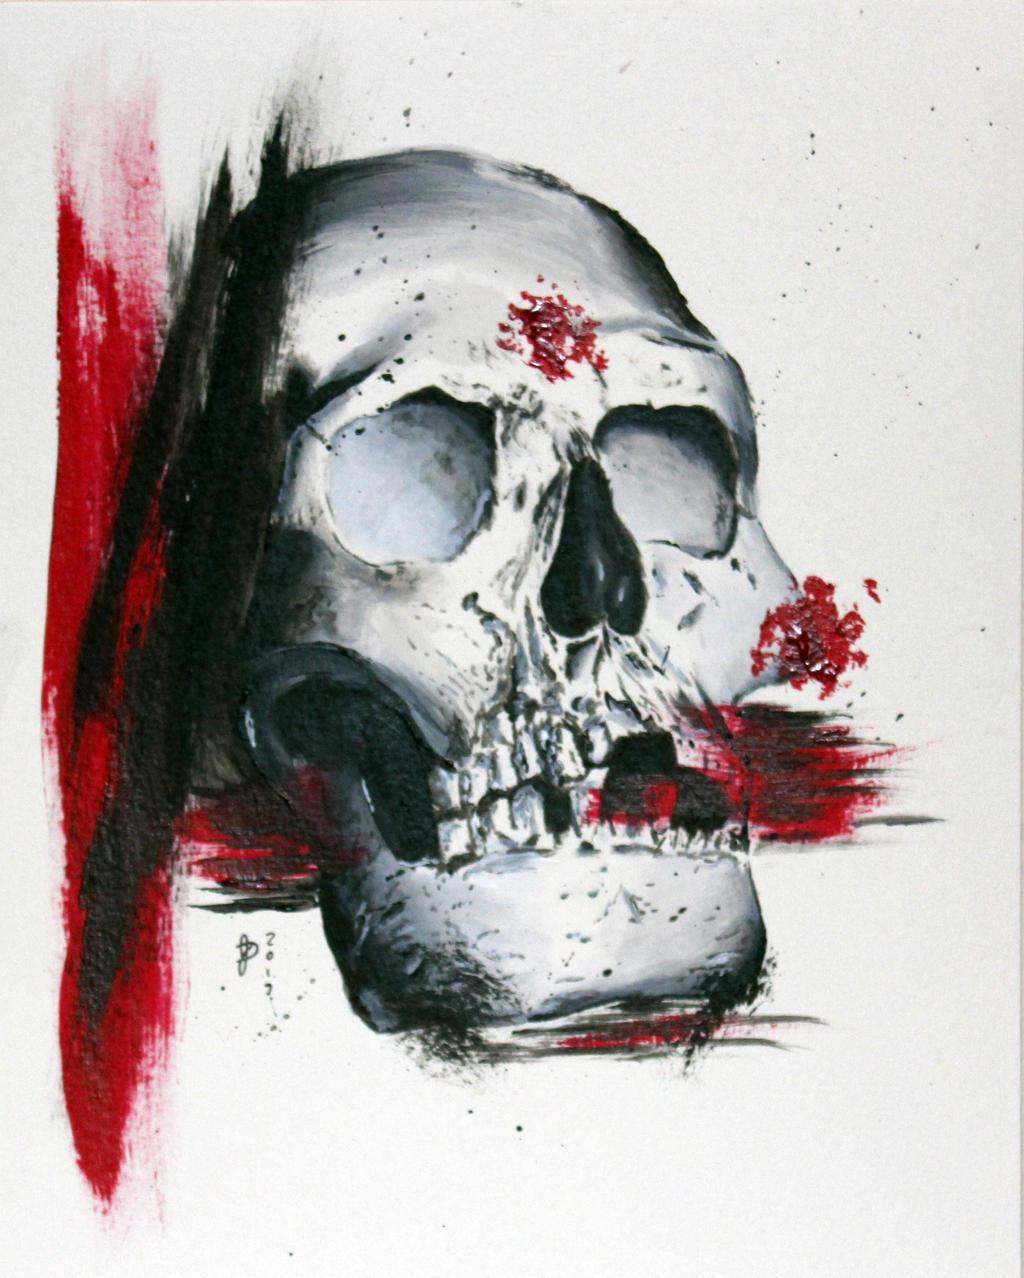 Trash Polka Skull By Mcrdesign On Deviantart: Trash Polka Skull By Jdelmontetattoos On DeviantArt